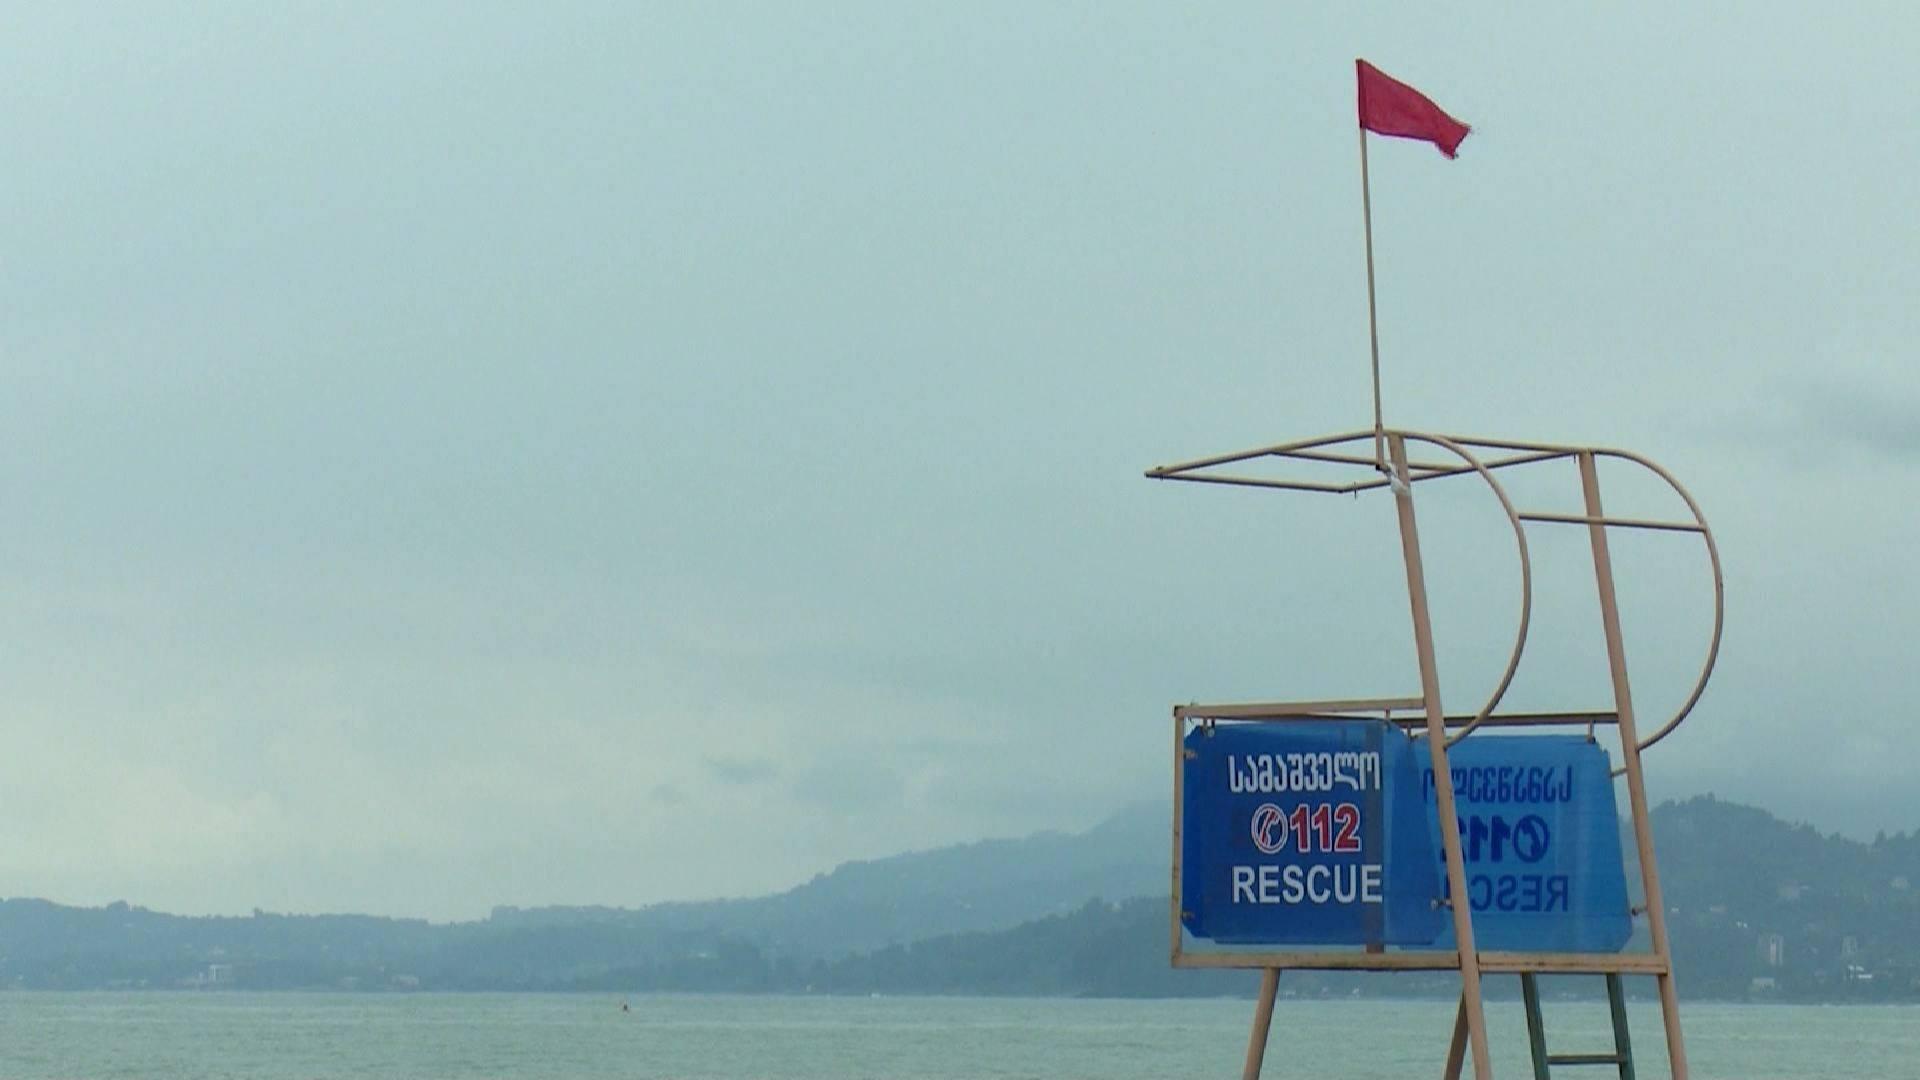 Photo of შავ ზღვაში ბანაობა აკრძალულია!_ შს სამინისტროს საგანგებო განცხადება